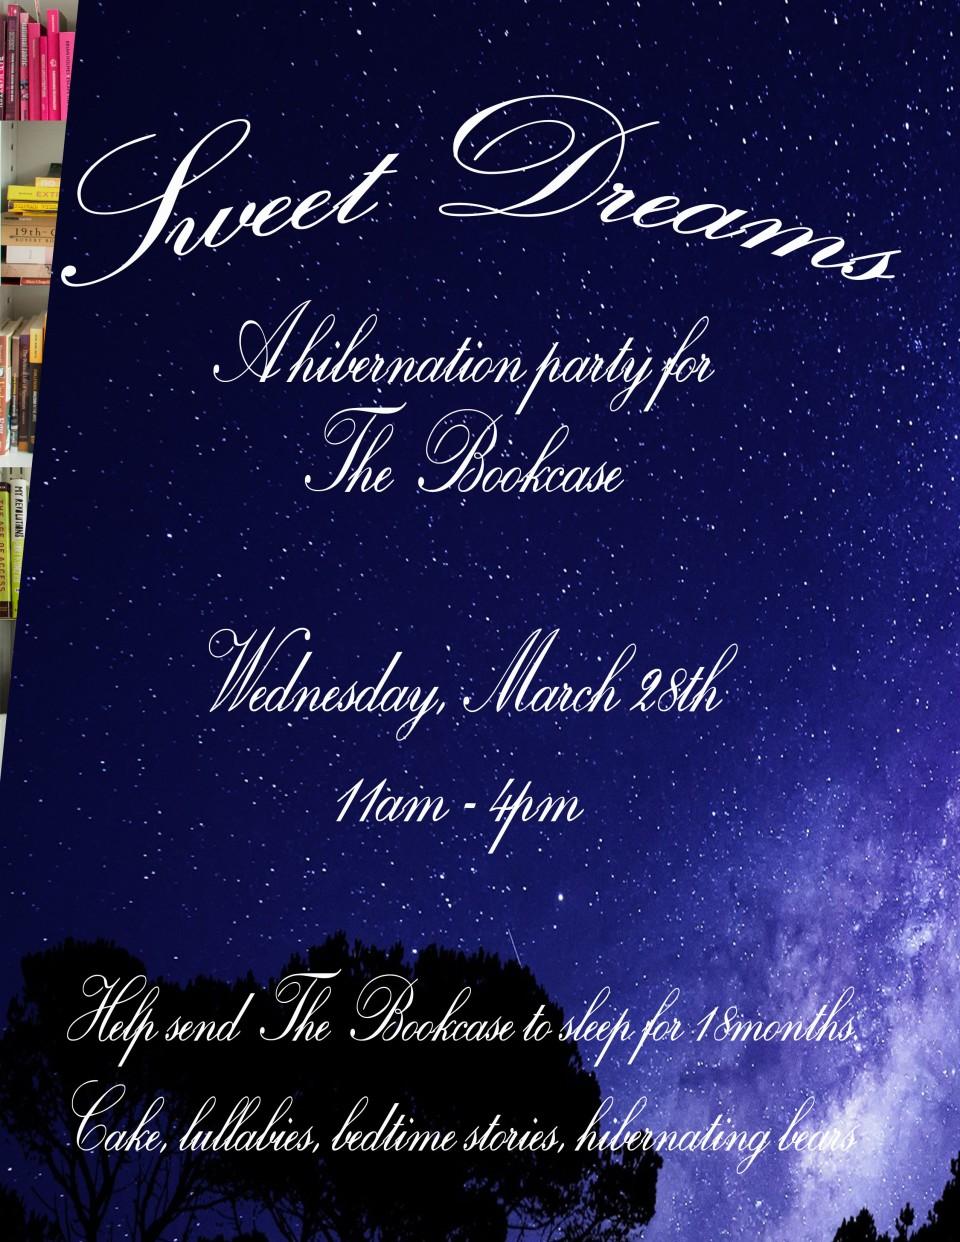 Hibernation party